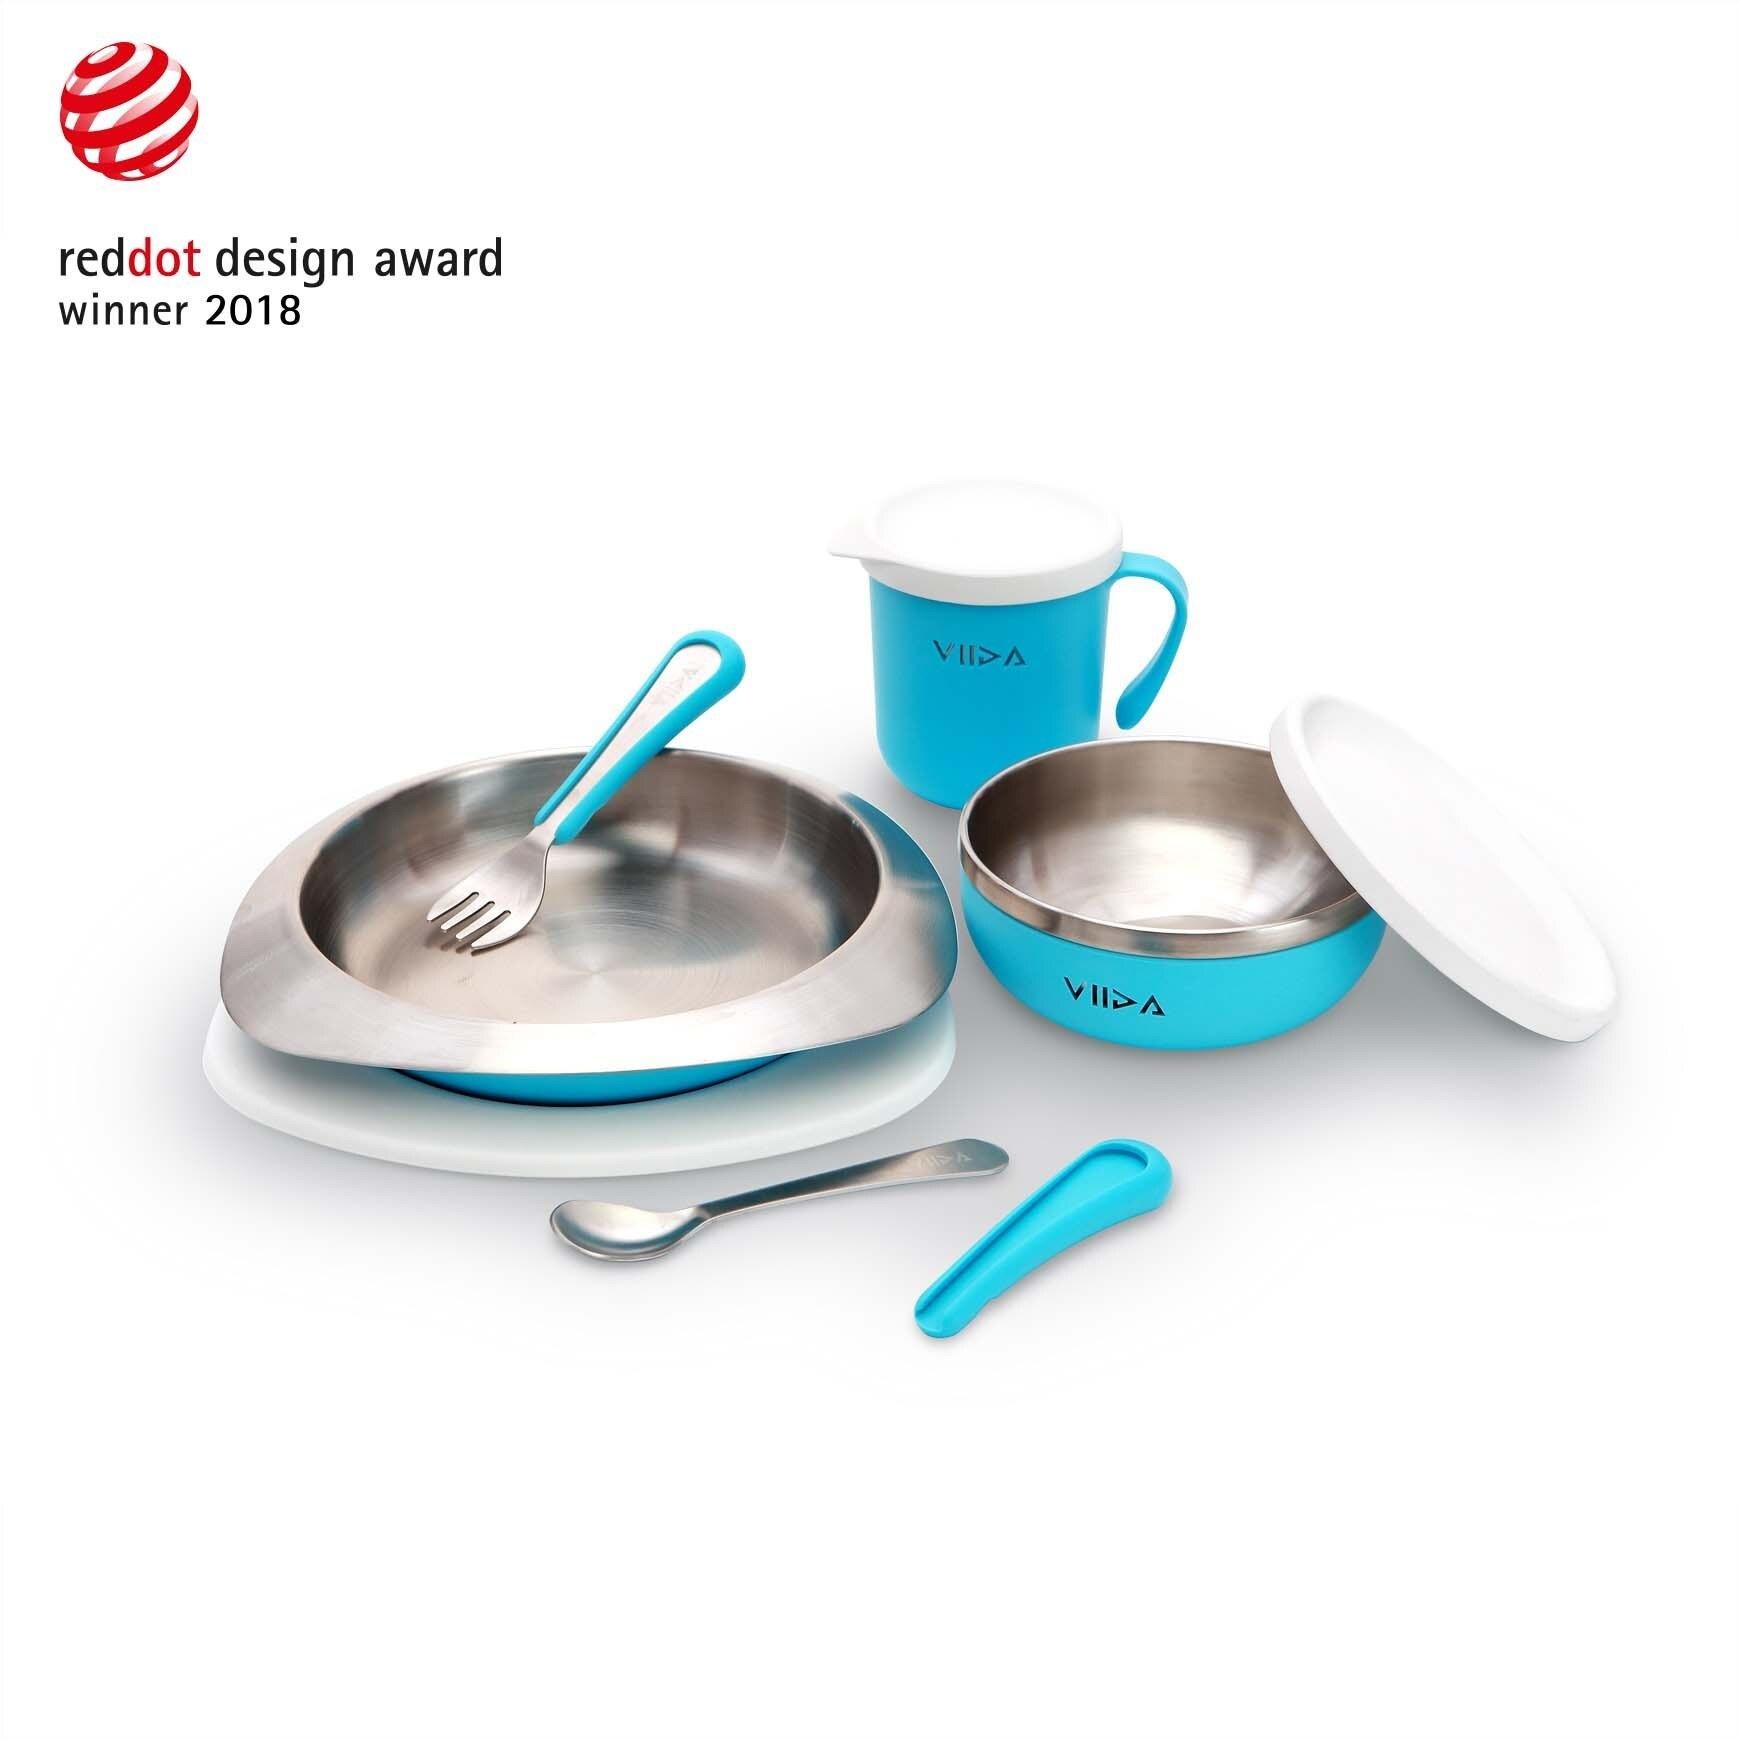 【VIIDA】Souffl  抗菌不鏽鋼餐具組 (寶貝藍)